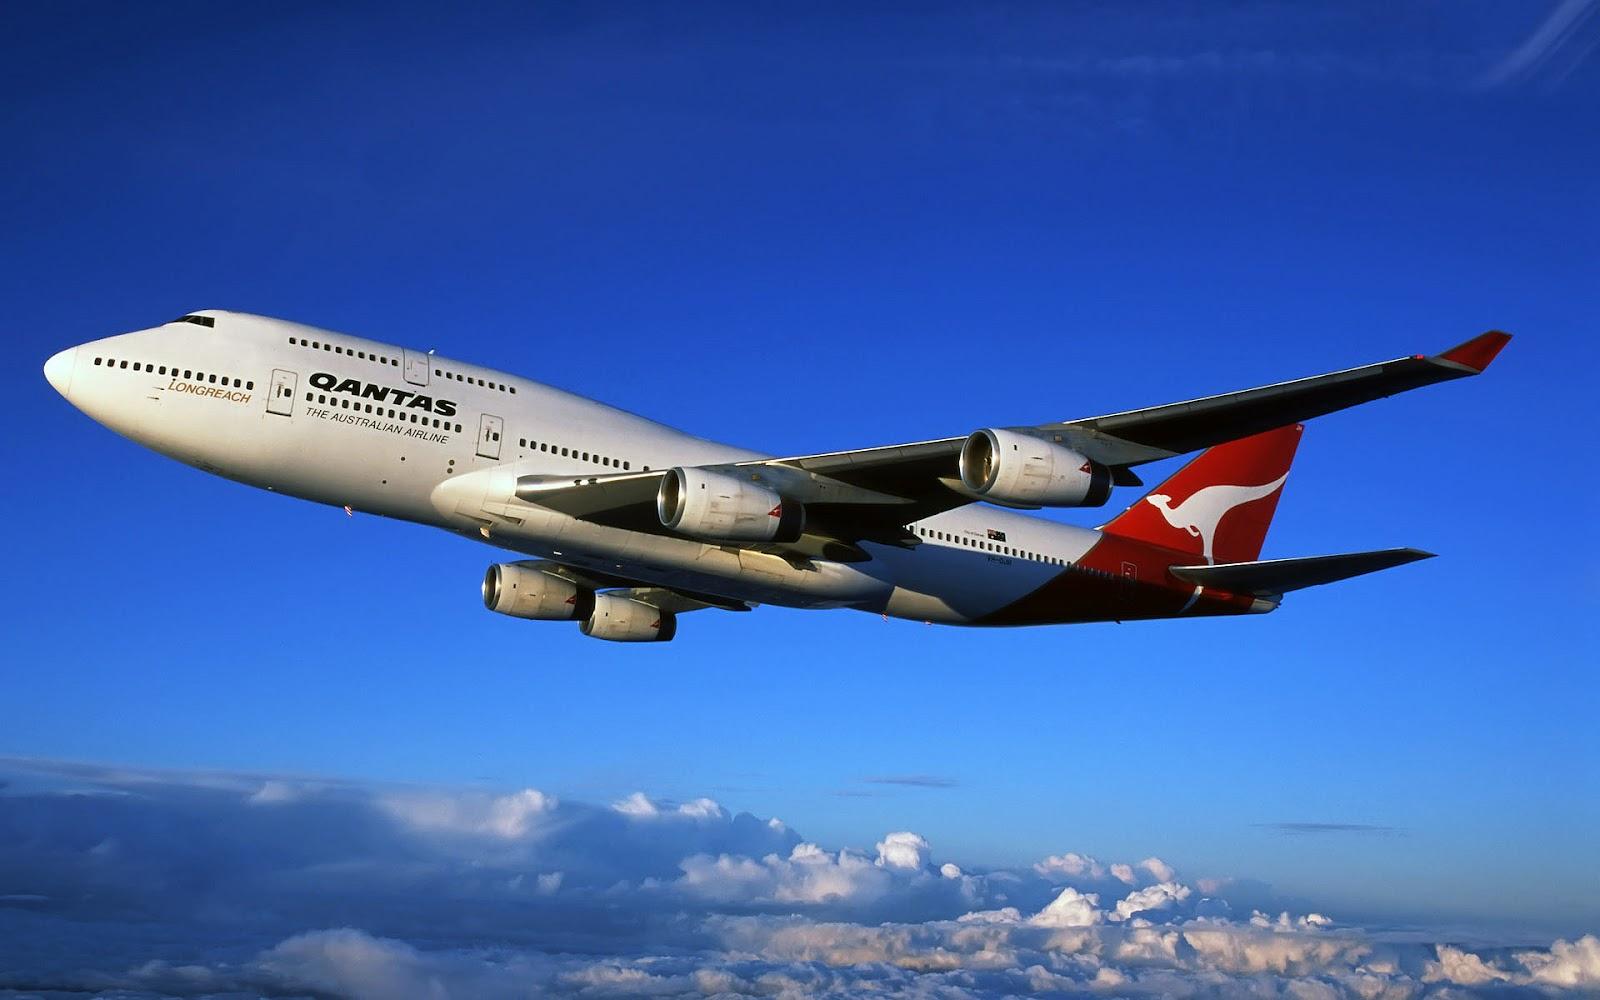 http://3.bp.blogspot.com/-lQ9MjeYbloE/T1dBVaGWhrI/AAAAAAAAa4E/Z_EMiXvTduQ/s1600/Mooie-vliegtuigen-achtergronden-hd-vliegtuig-wallpapers-afbeelding-foto-02.jpg